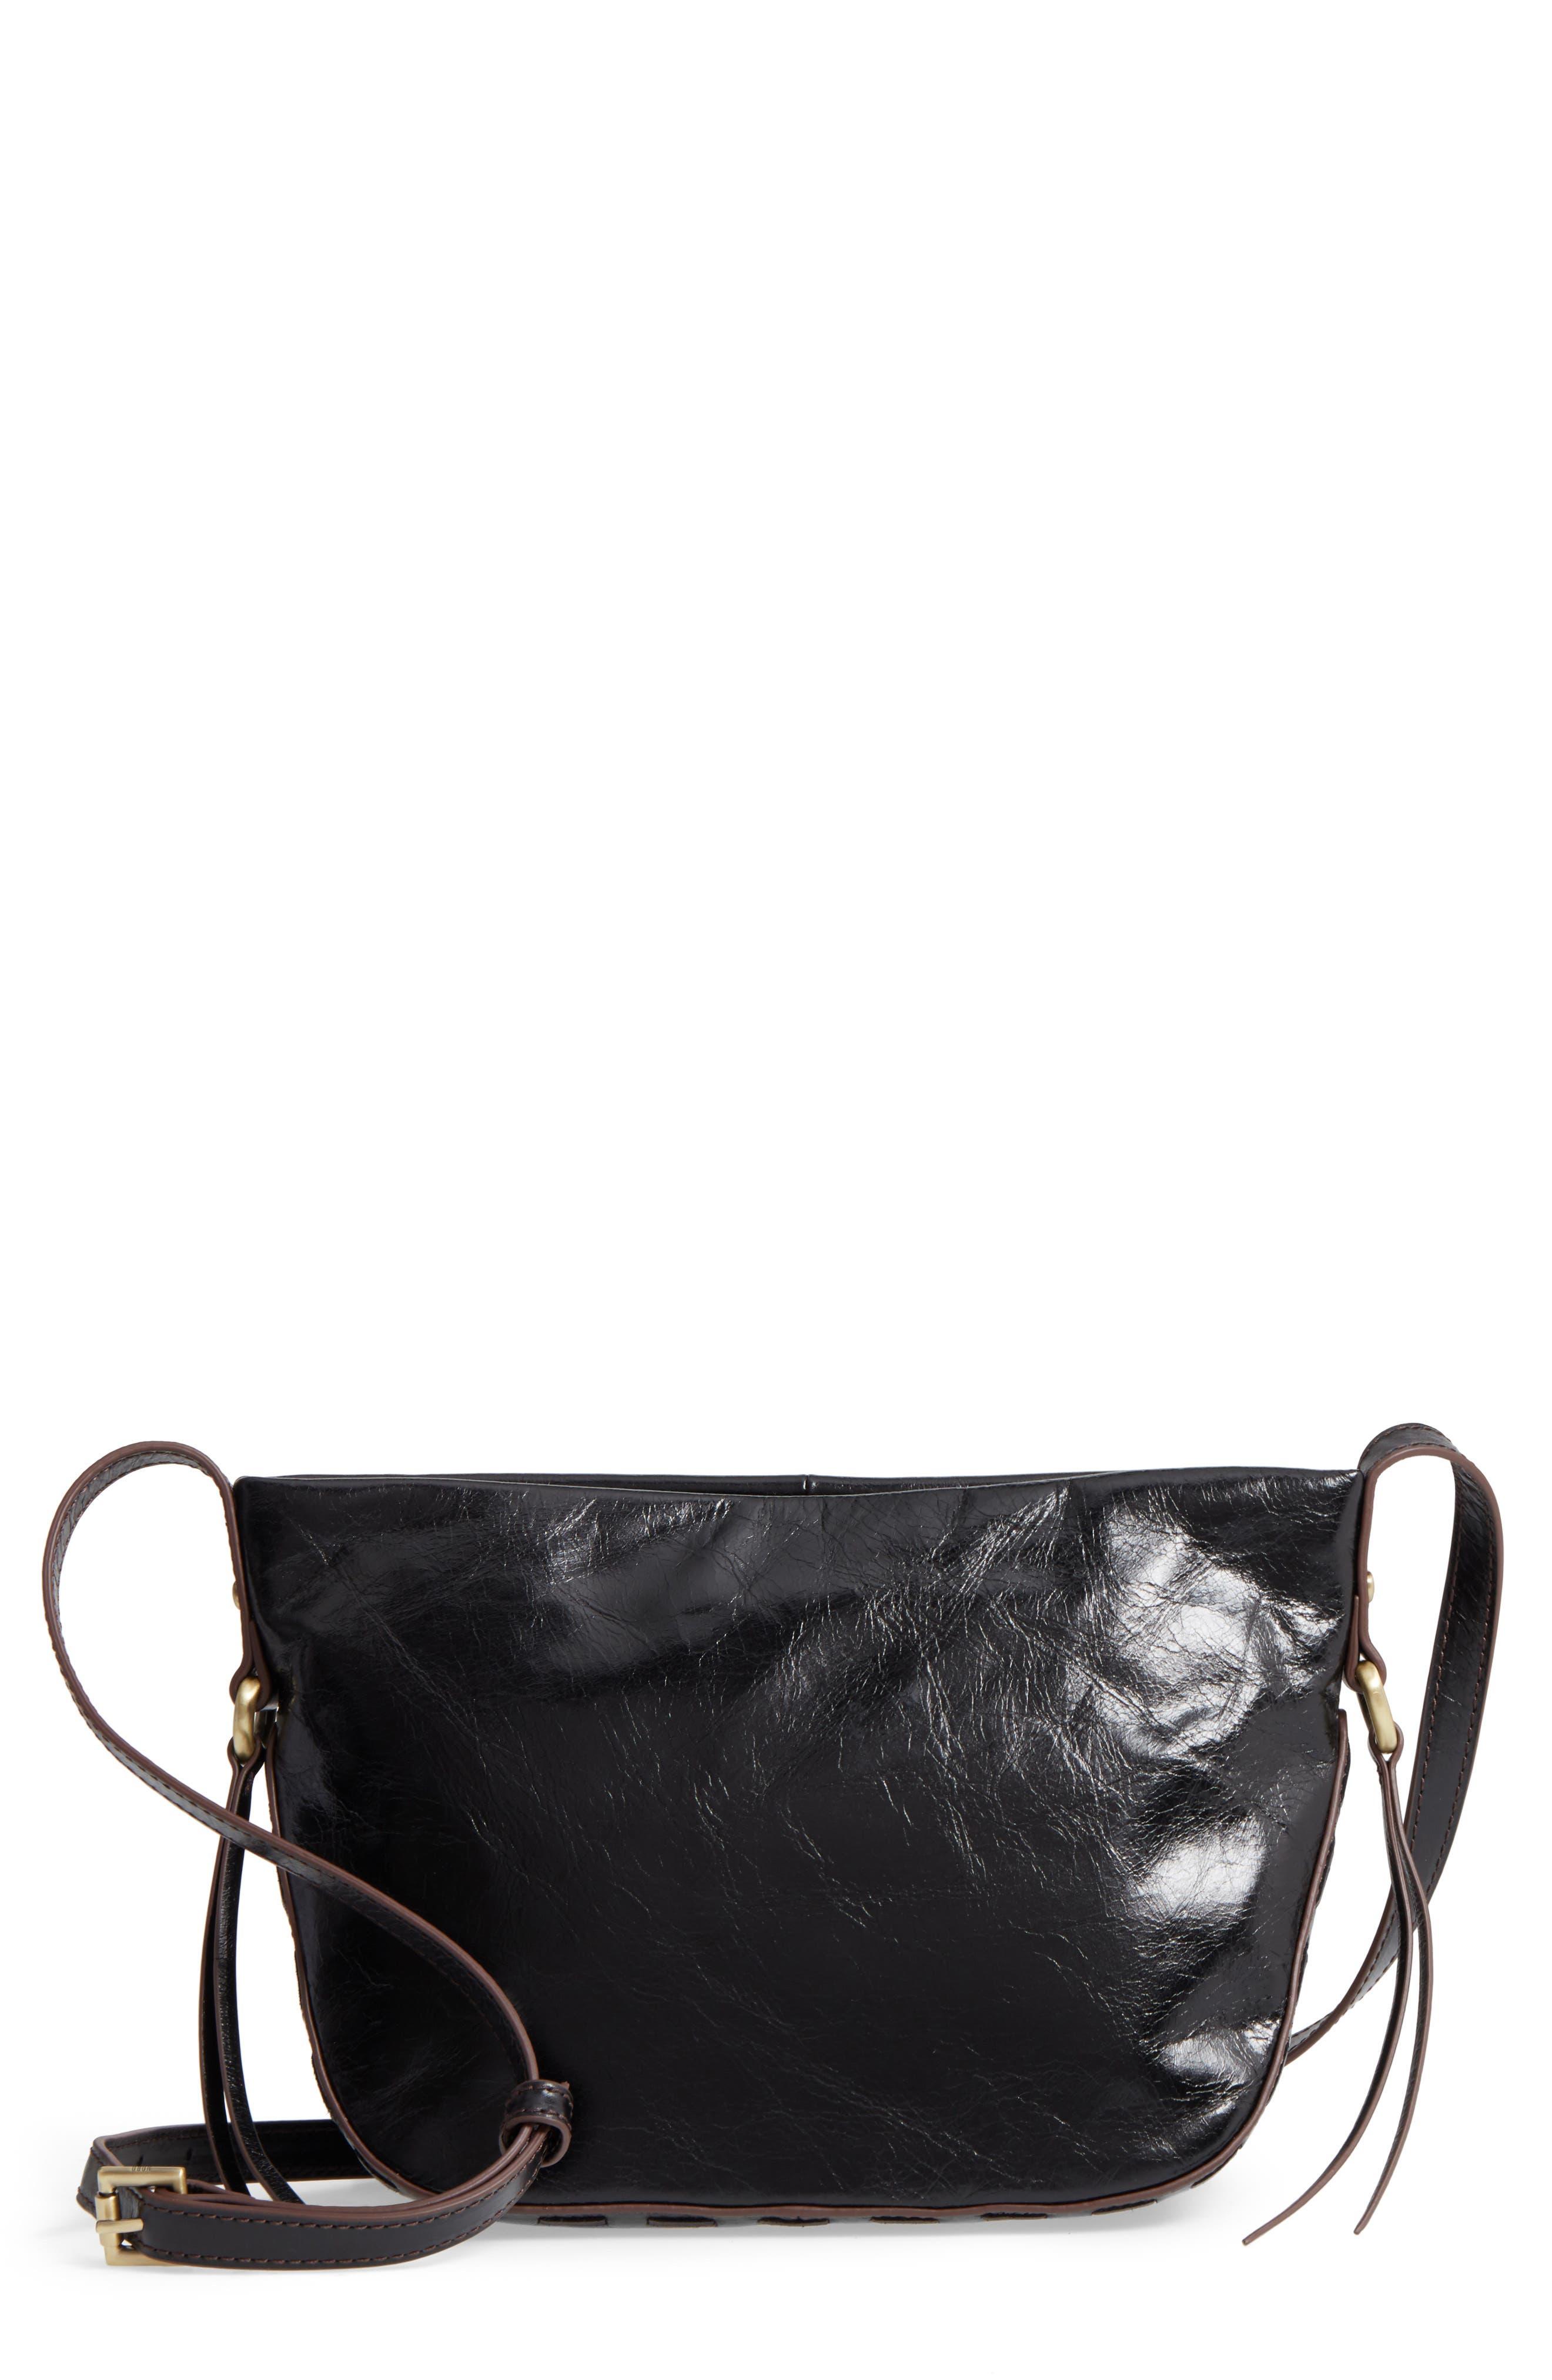 Muse Calfskin Leather Crossbody Bag,                         Main,                         color, 001